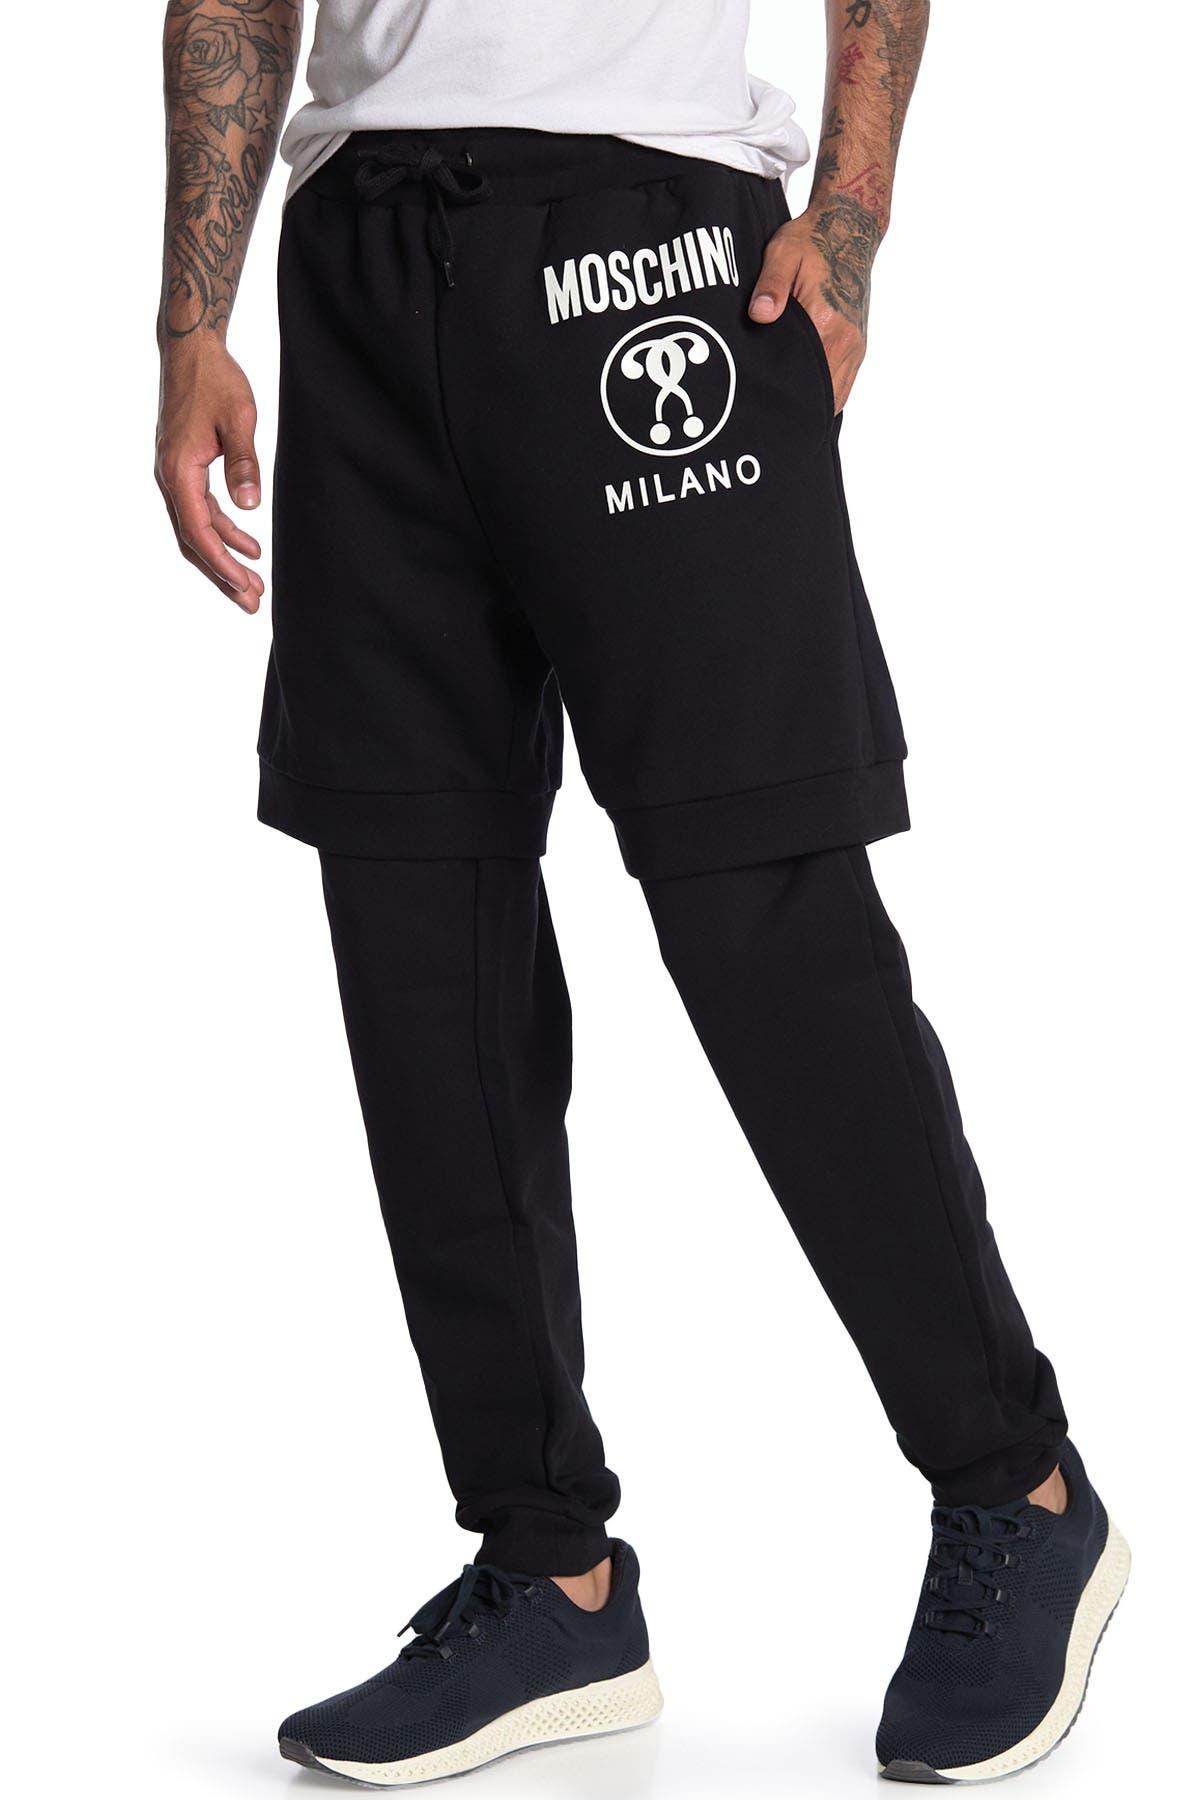 Image of MOSCHINO Sweat Shorts